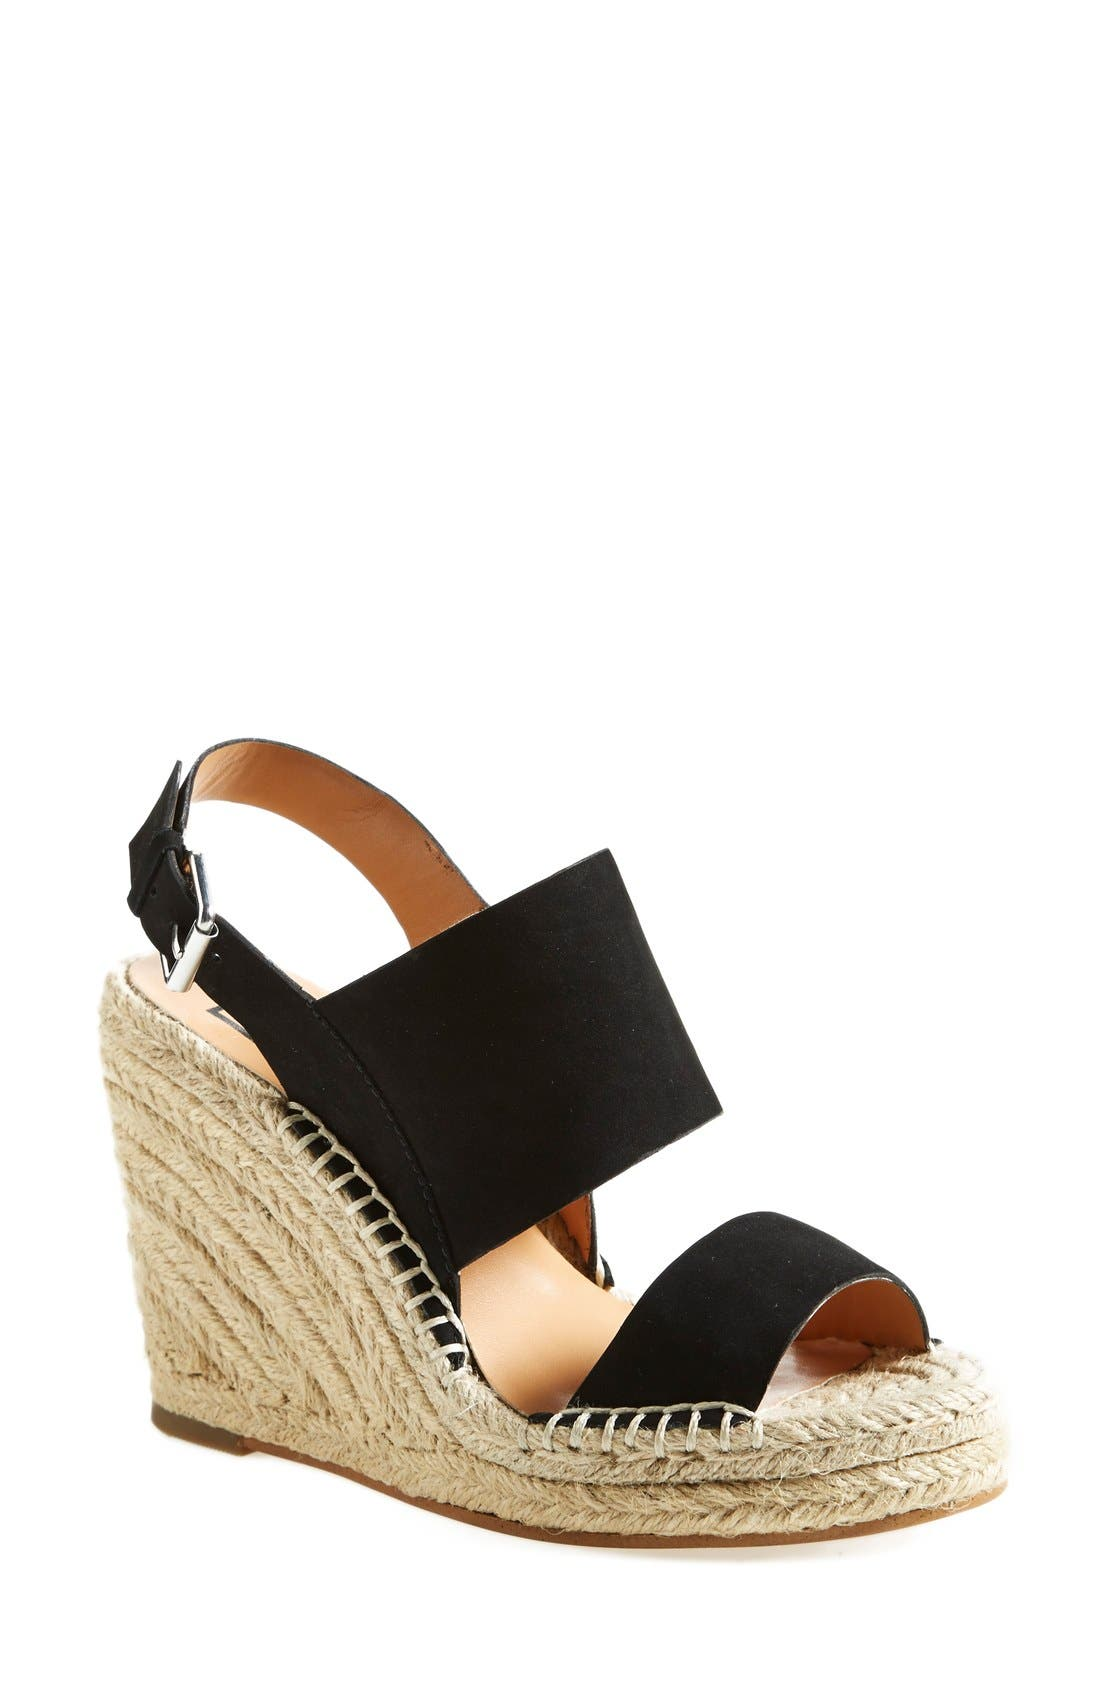 DV BY DOLCE VITA 'Shady' Wedge Sandal, Main, color, 001